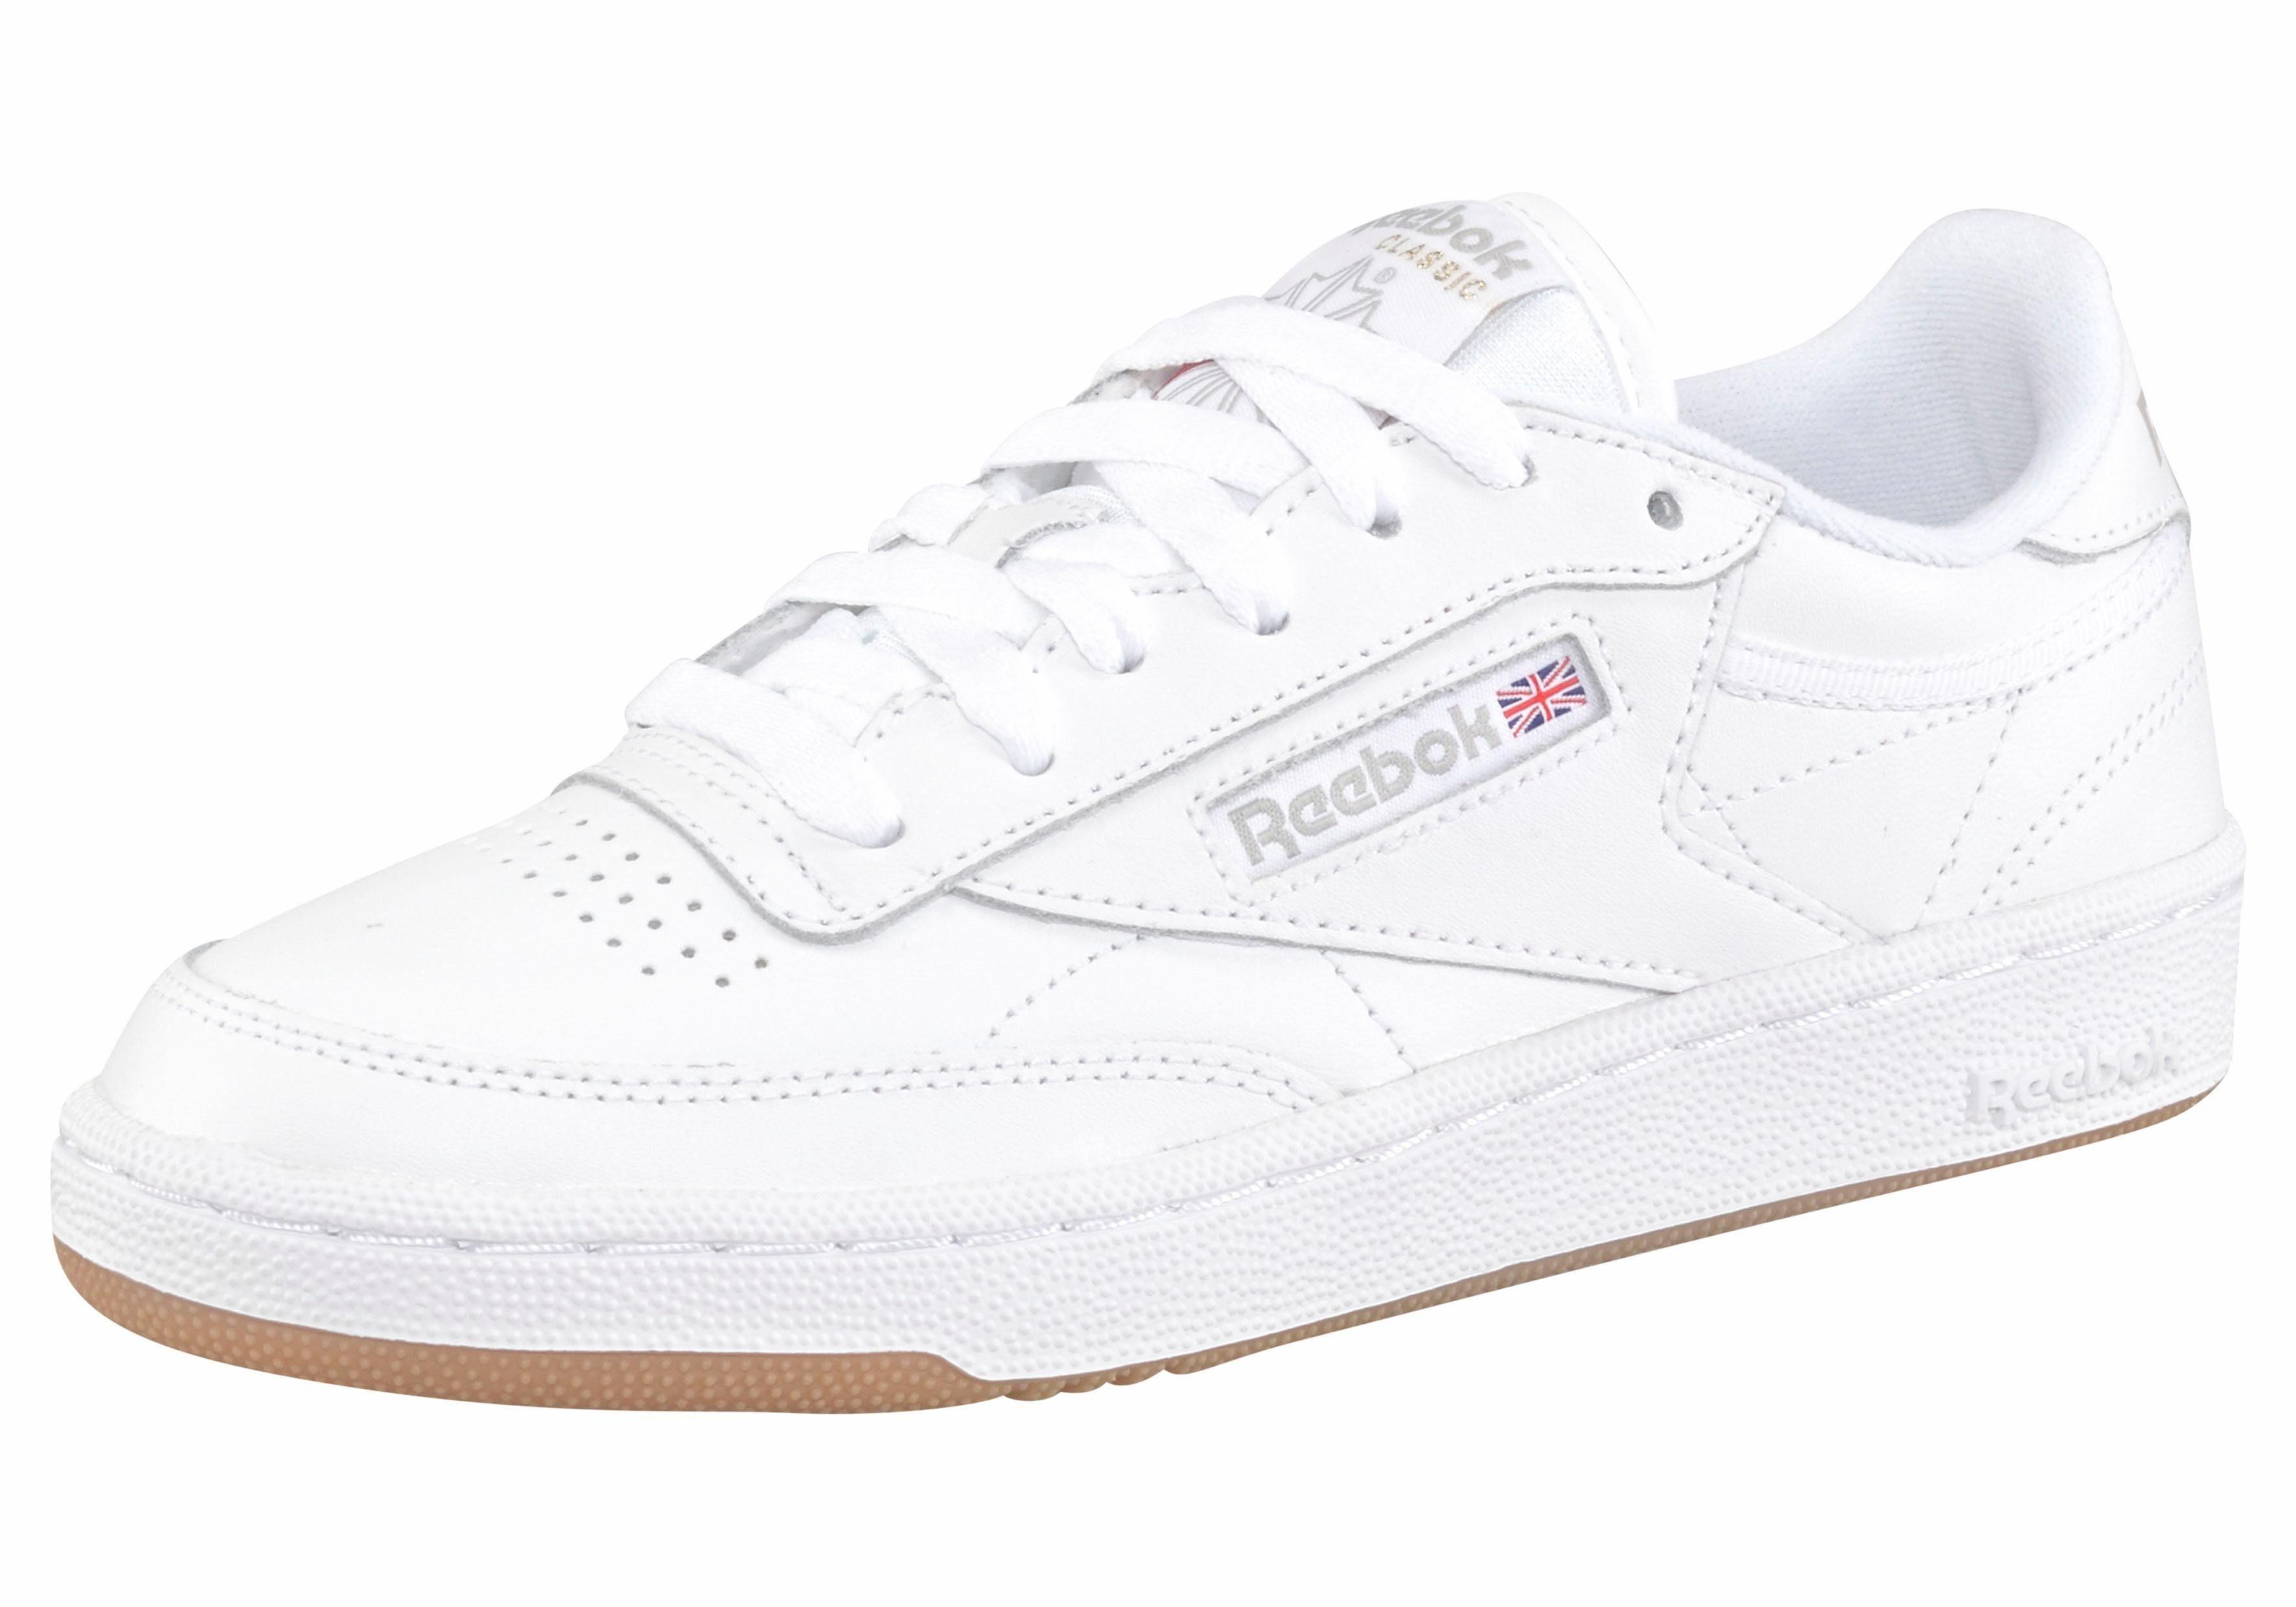 Reebok Classic »Club C 85 W« Sneaker, Stabile Gummilaufsohle online kaufen | OTTO